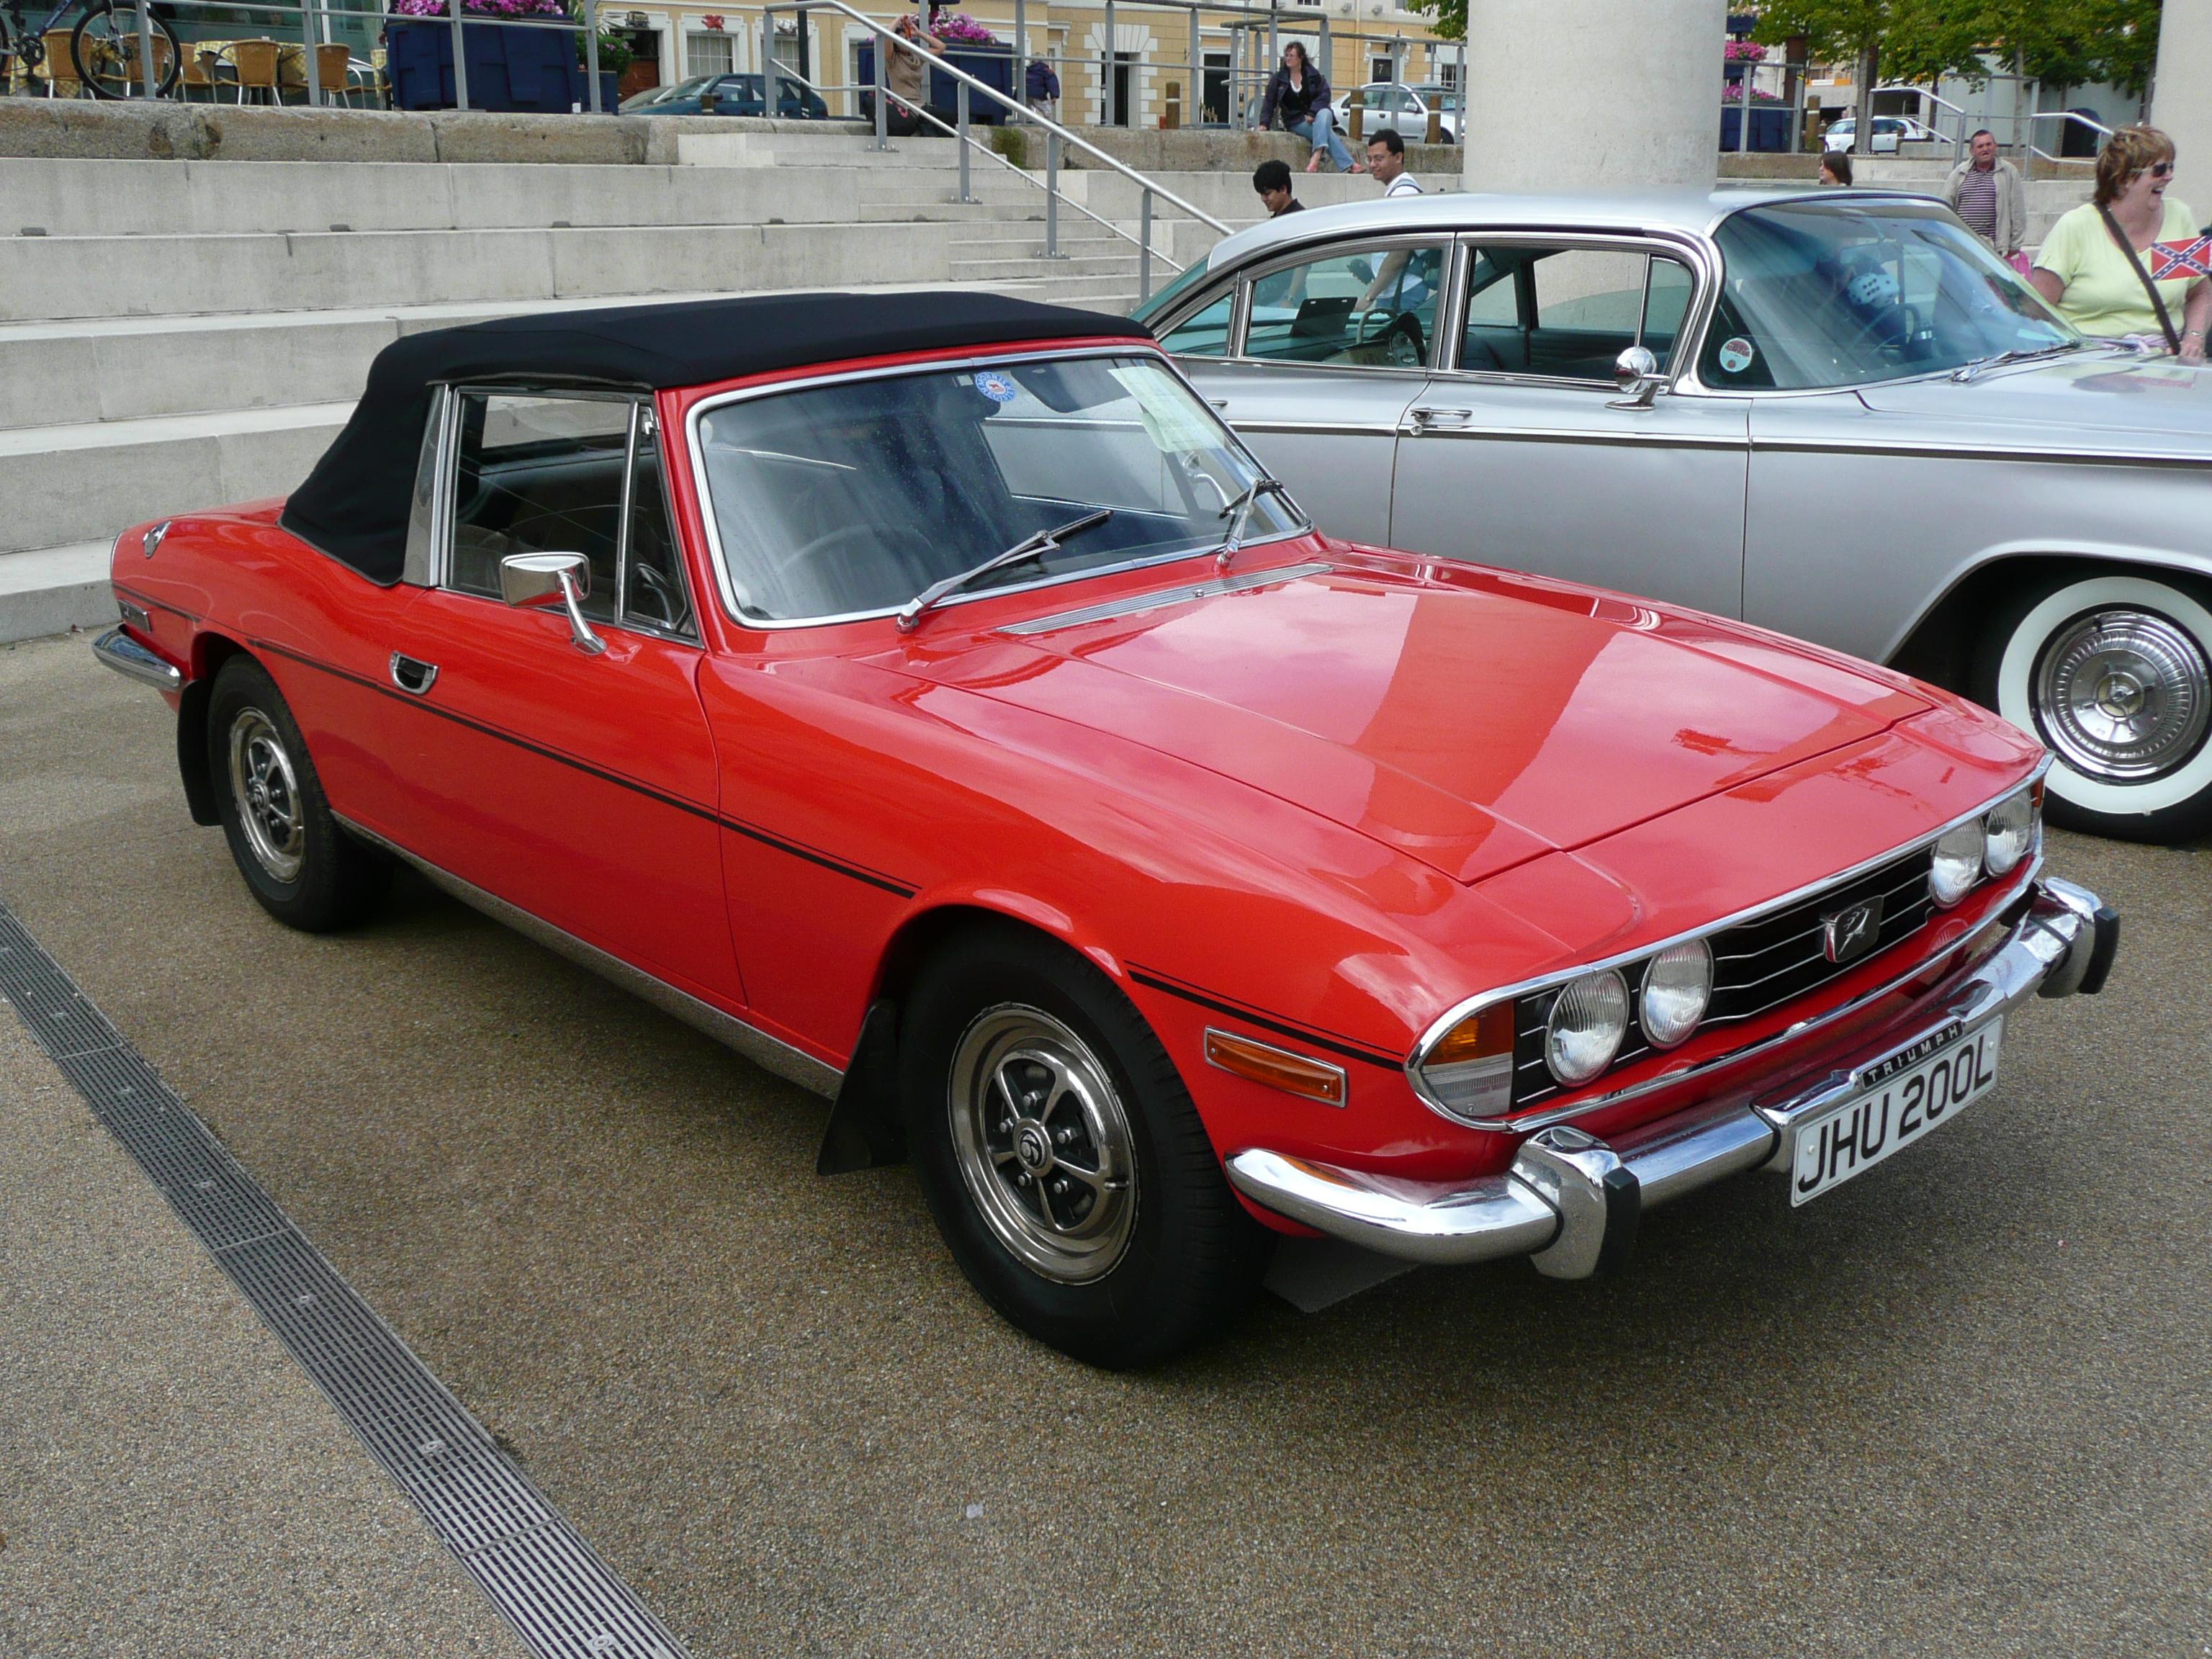 Triumph Stag 1970 - 1977 Cabriolet #1